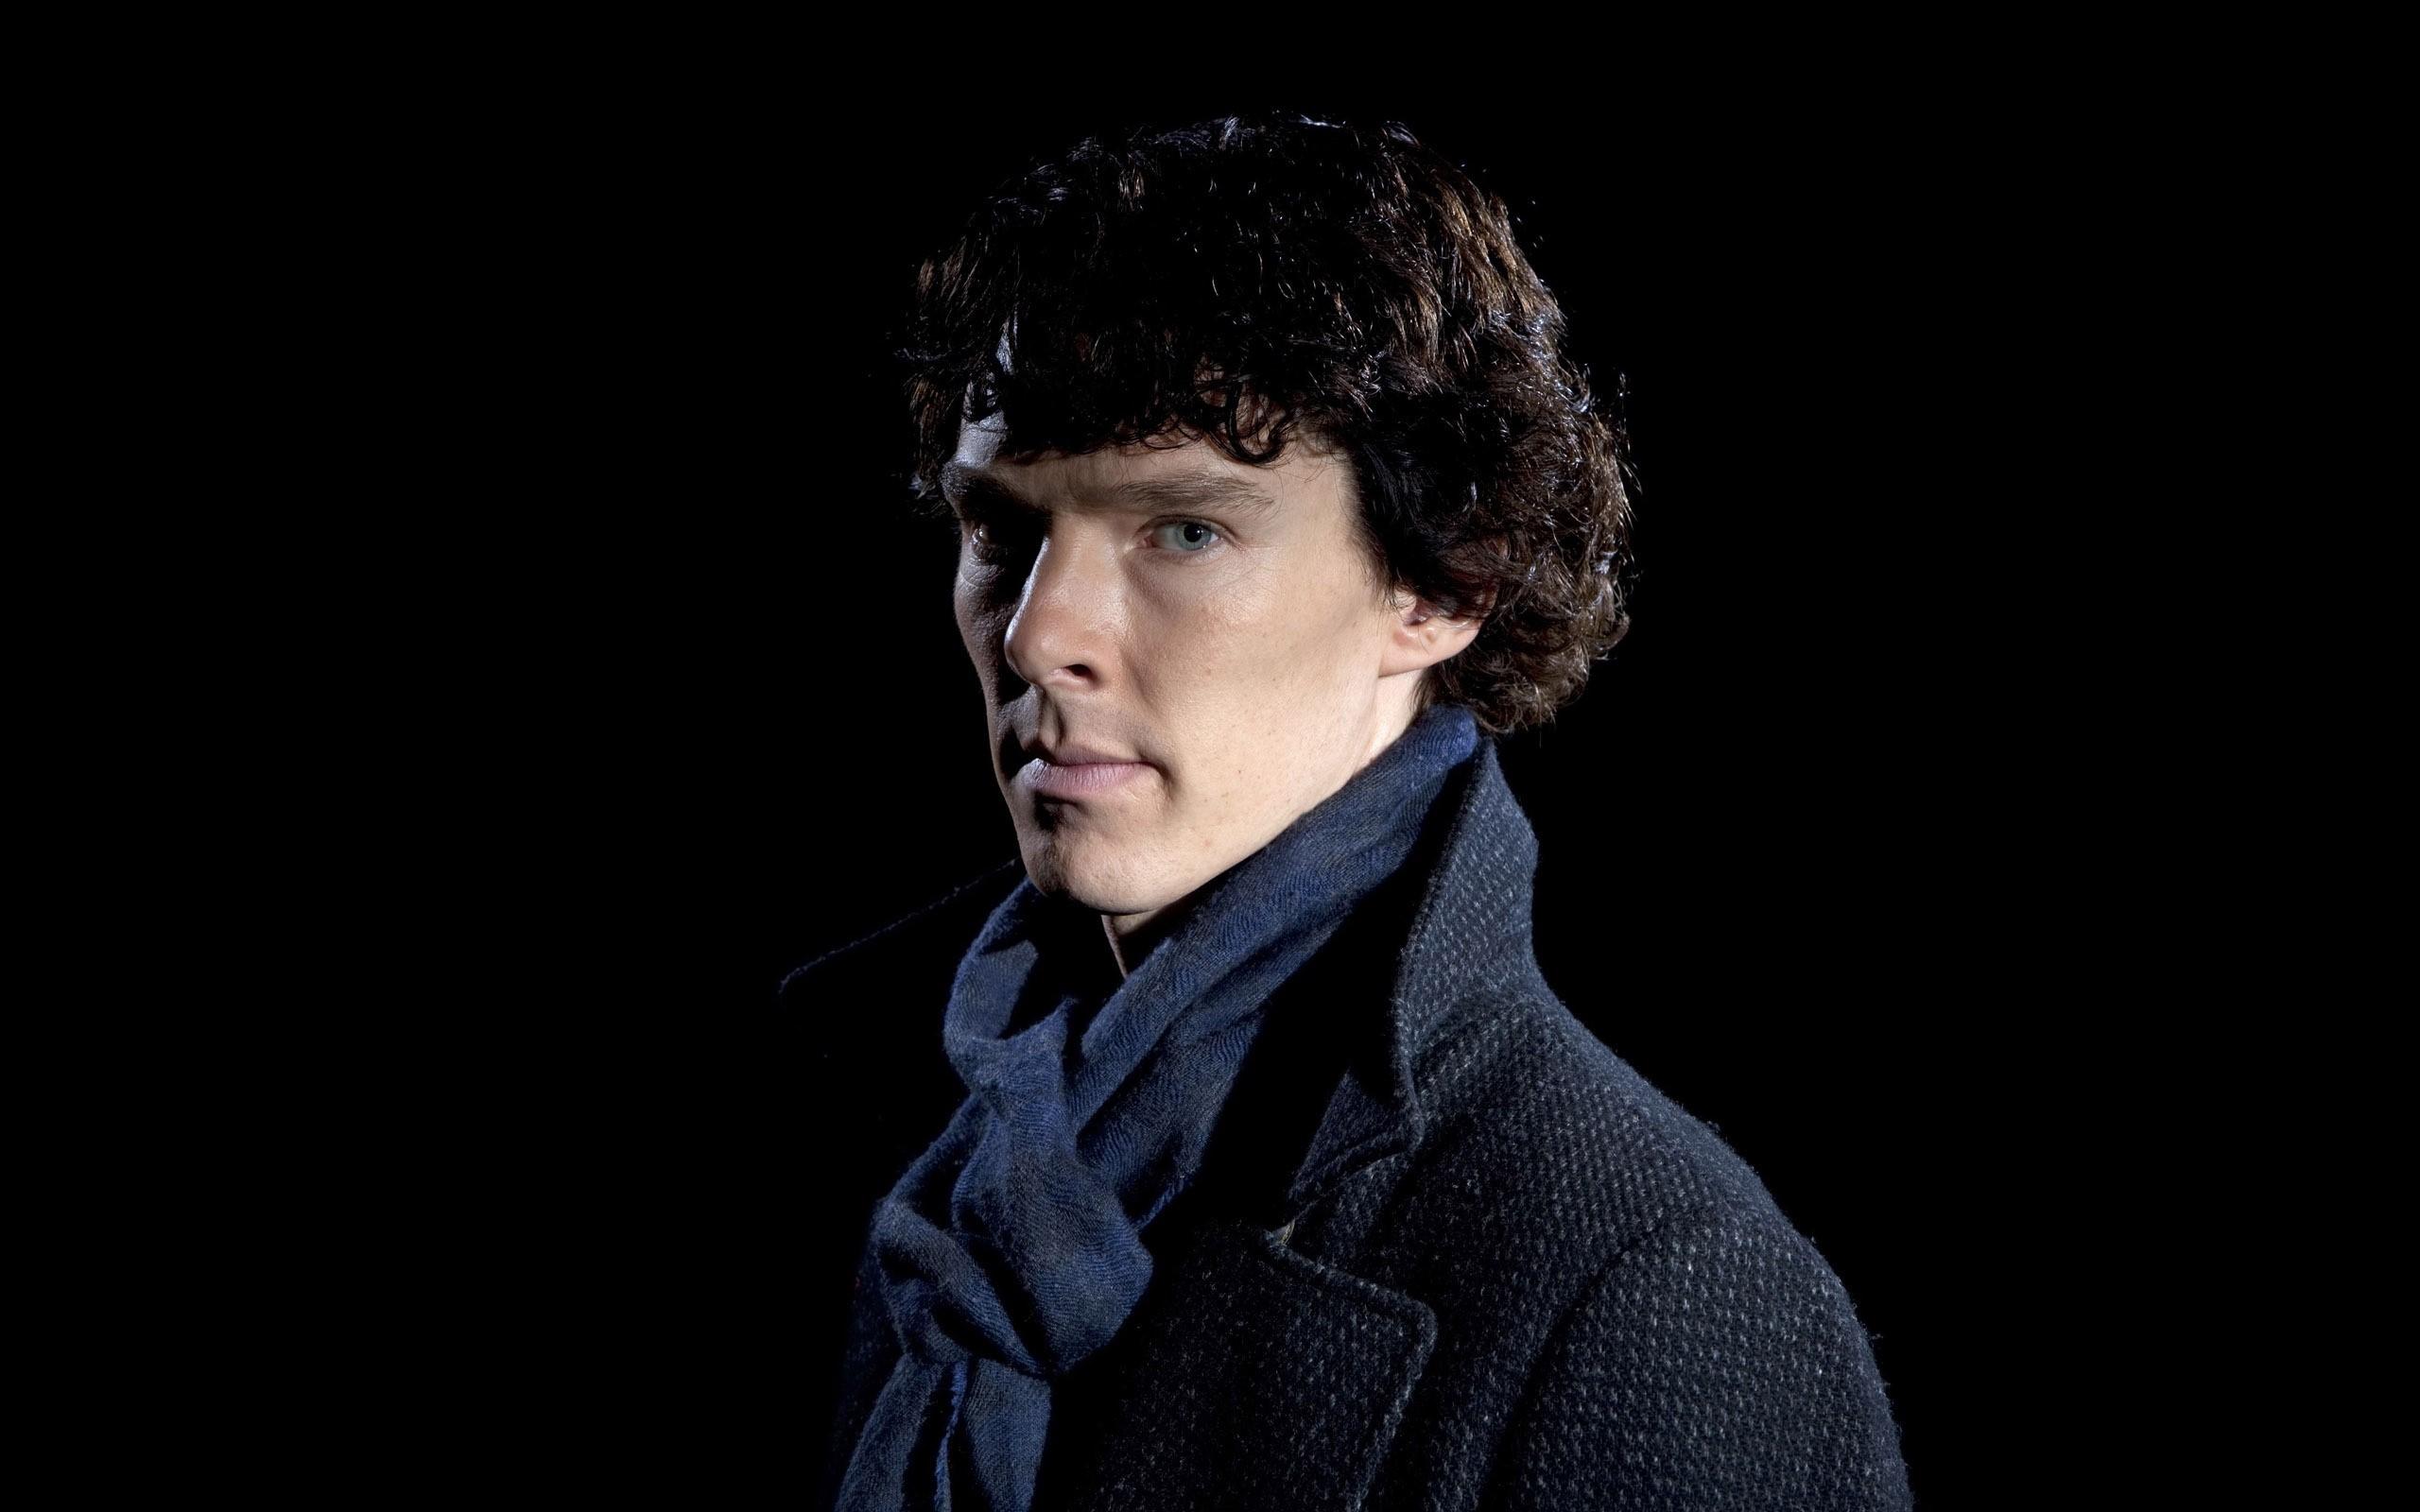 Benedict Cumberbatch Wallpapers 3